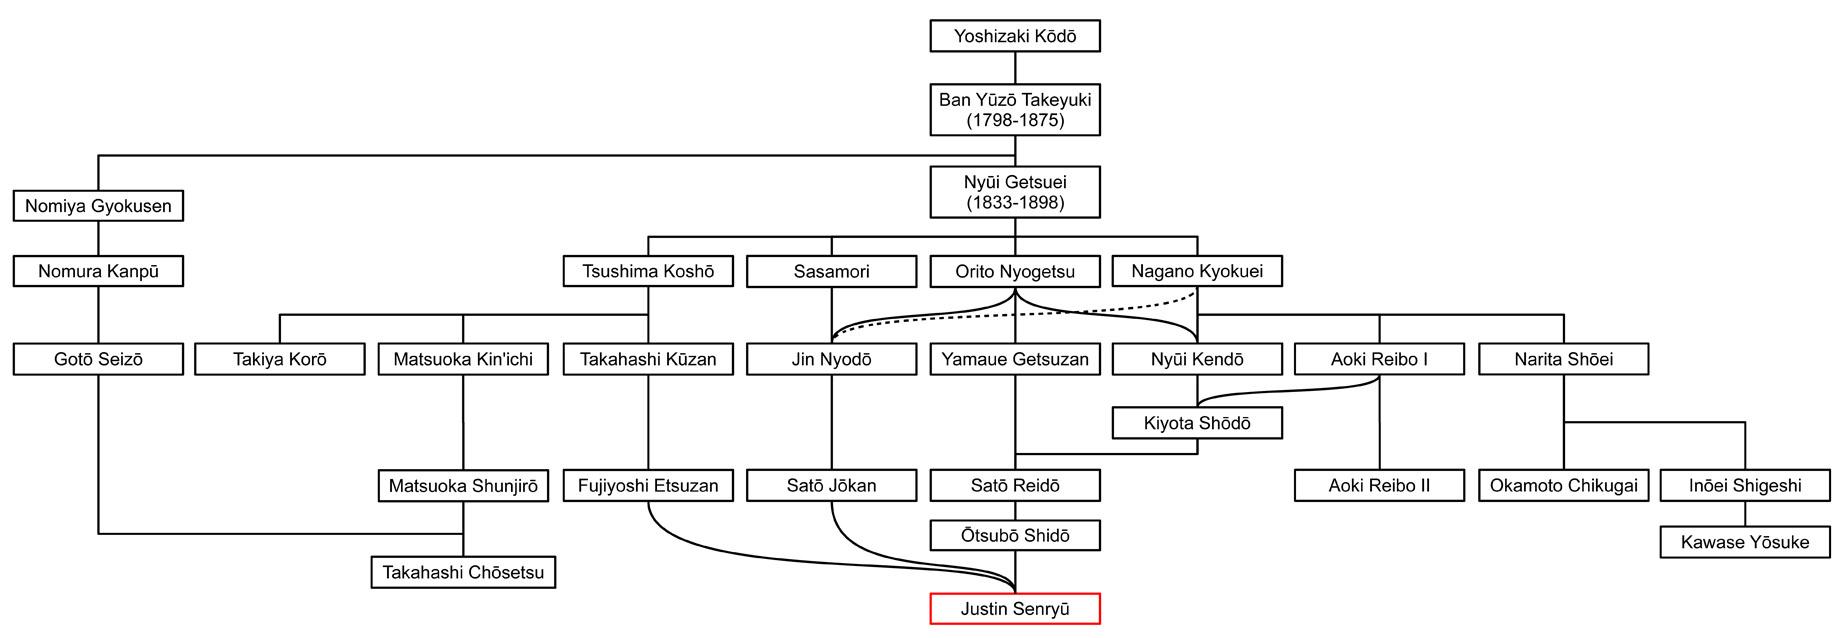 Kimpu Ryu Nezasa Ha shakuhachi honkyoku lineage chart